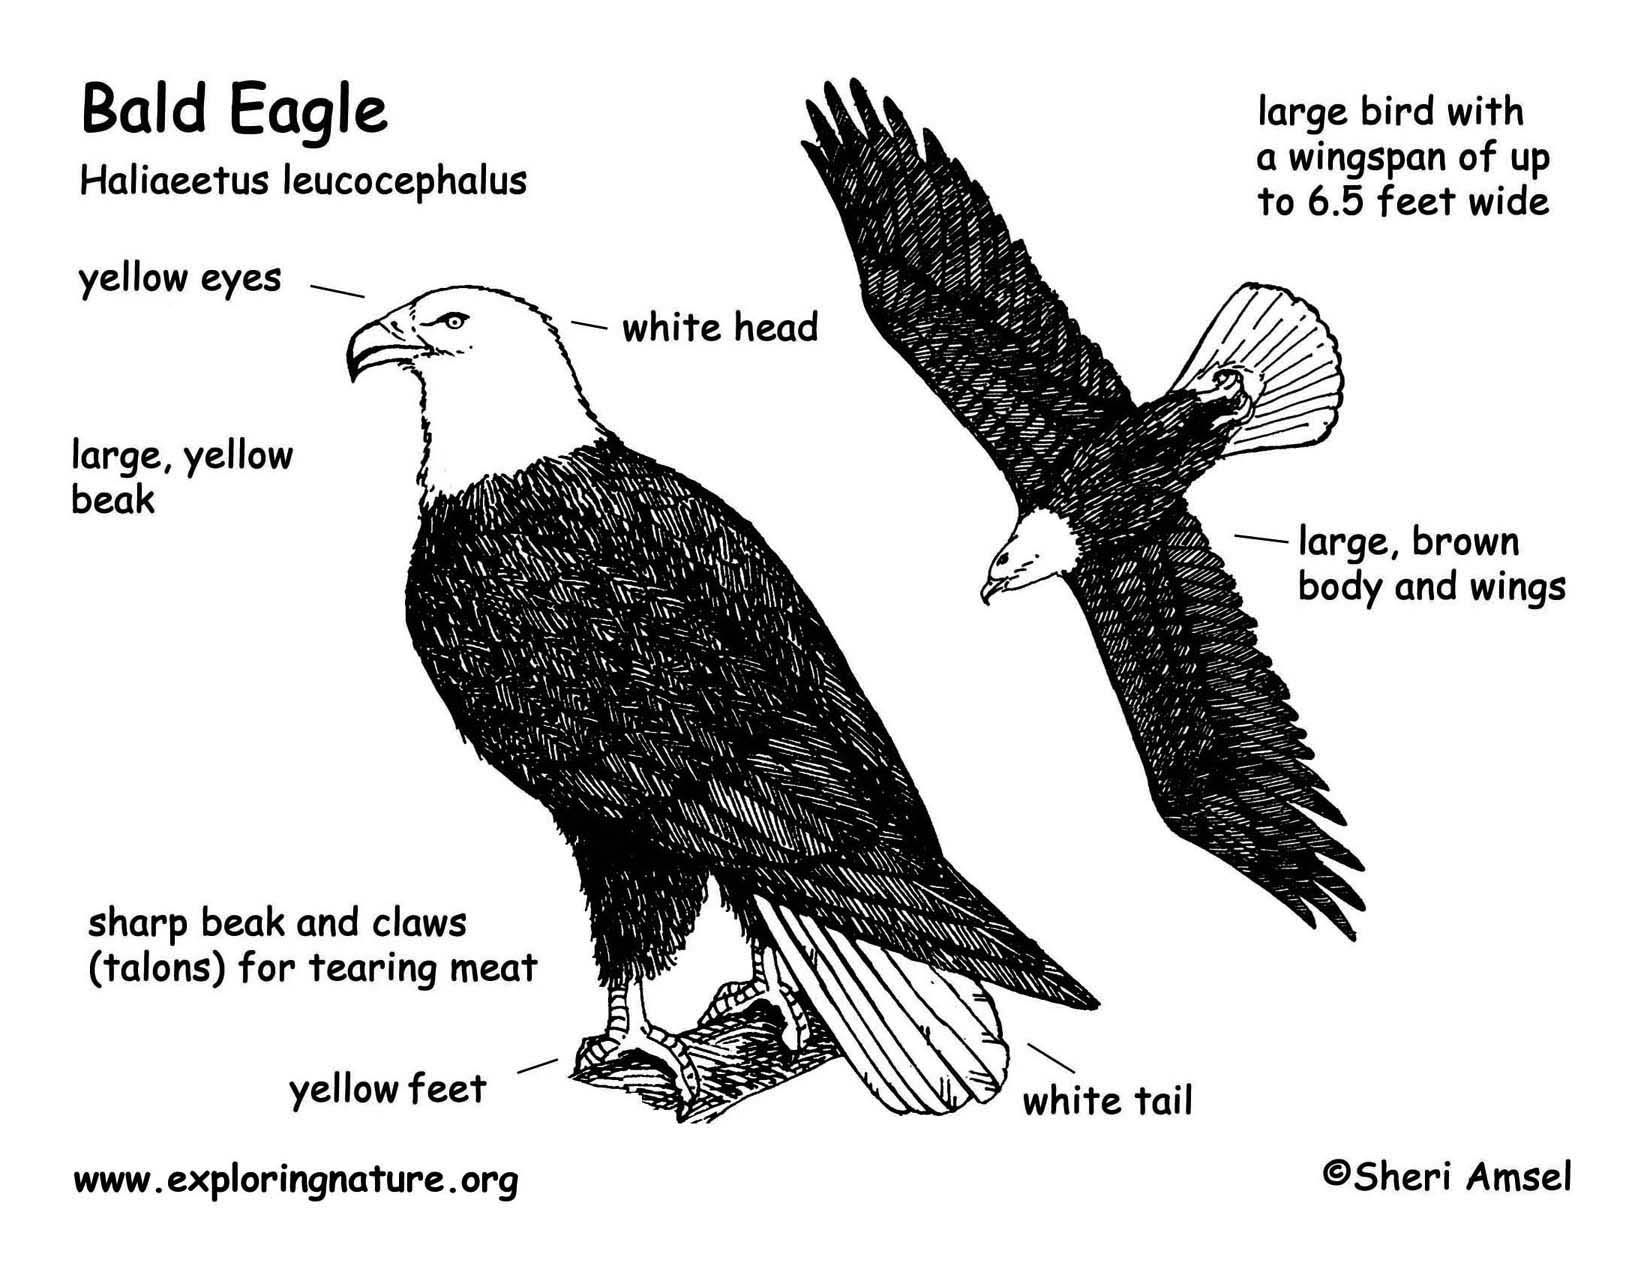 golden eagle vs bald eagle